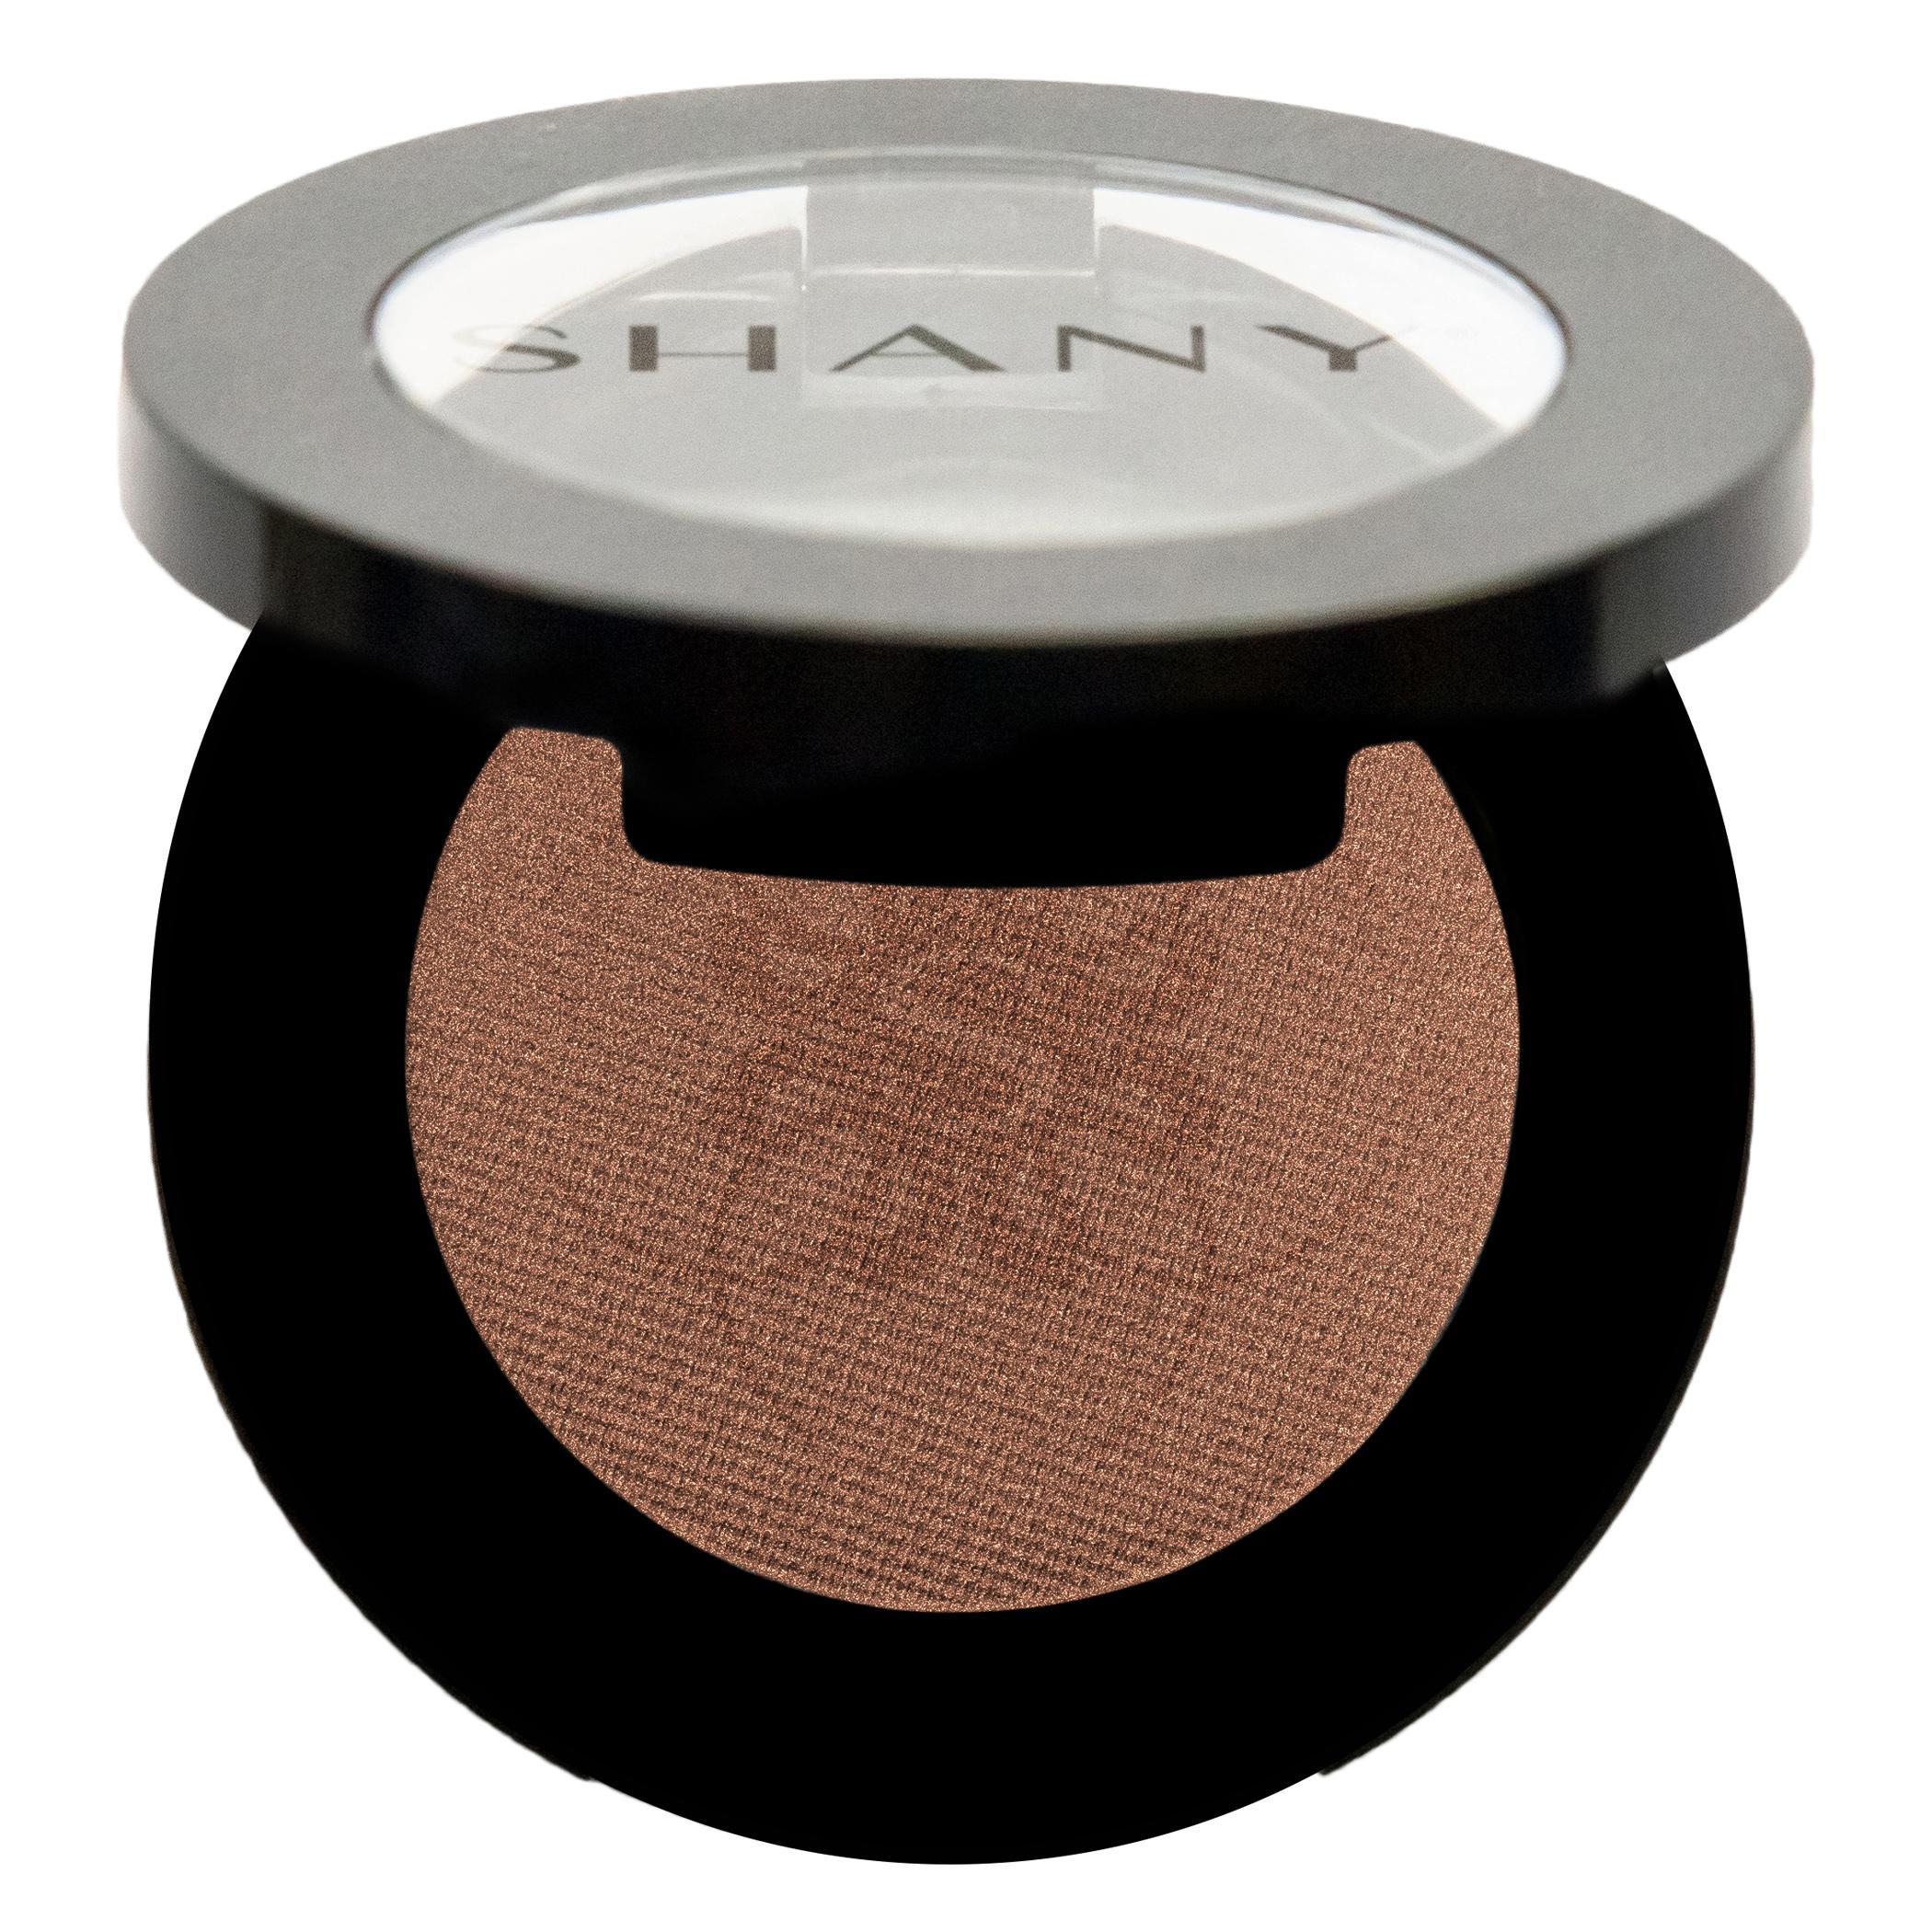 Amazon.com : SHANY Paraben Free Silky Shimmer Eye Shadow, Contender, 1